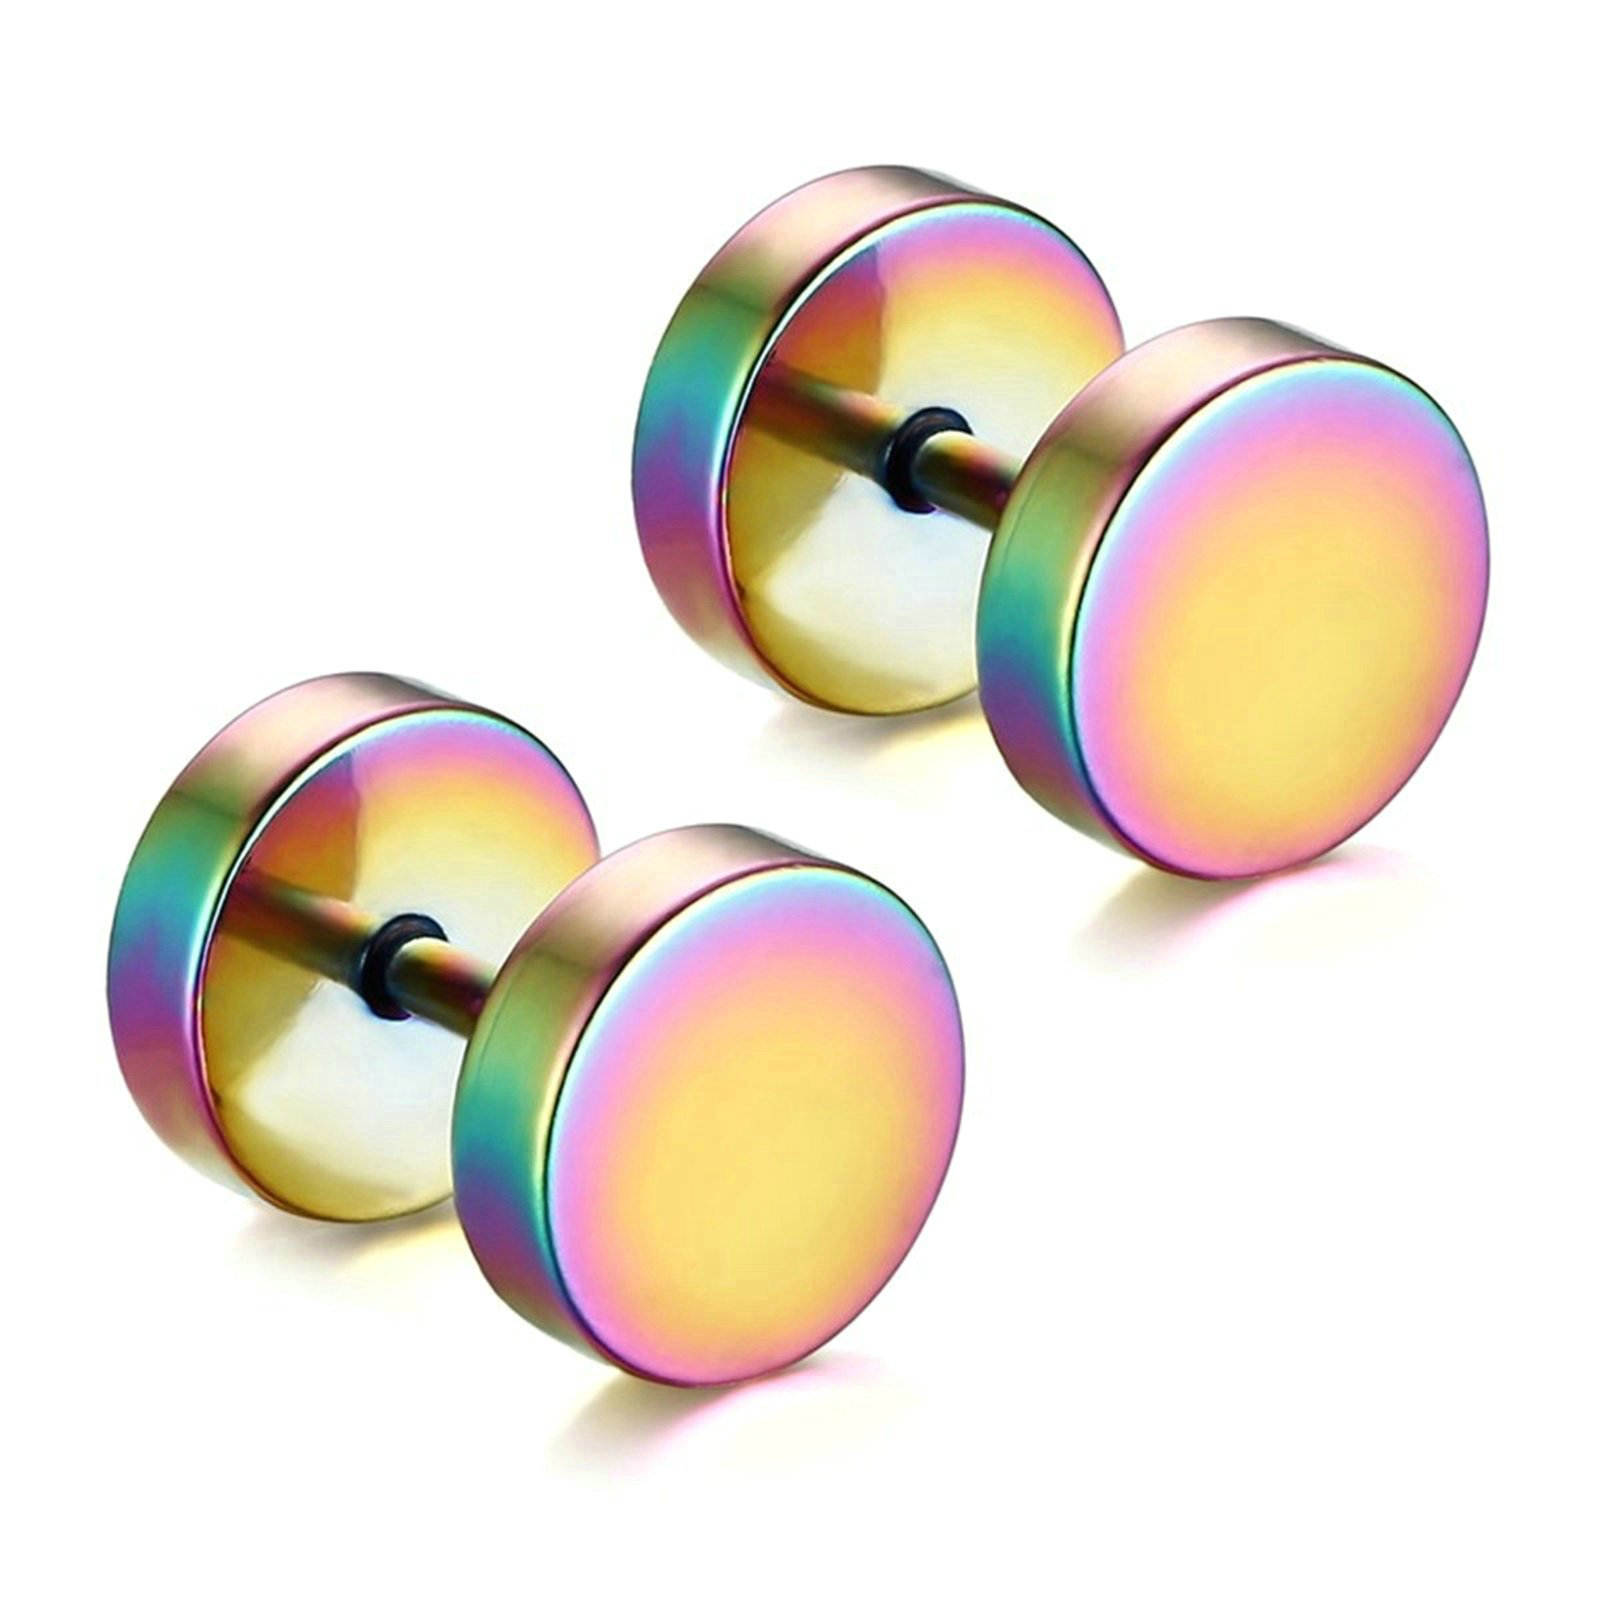 Aooaz Unisex stainless steel Earrings Round Stud Earrings 11MM Screw Back Multi Color